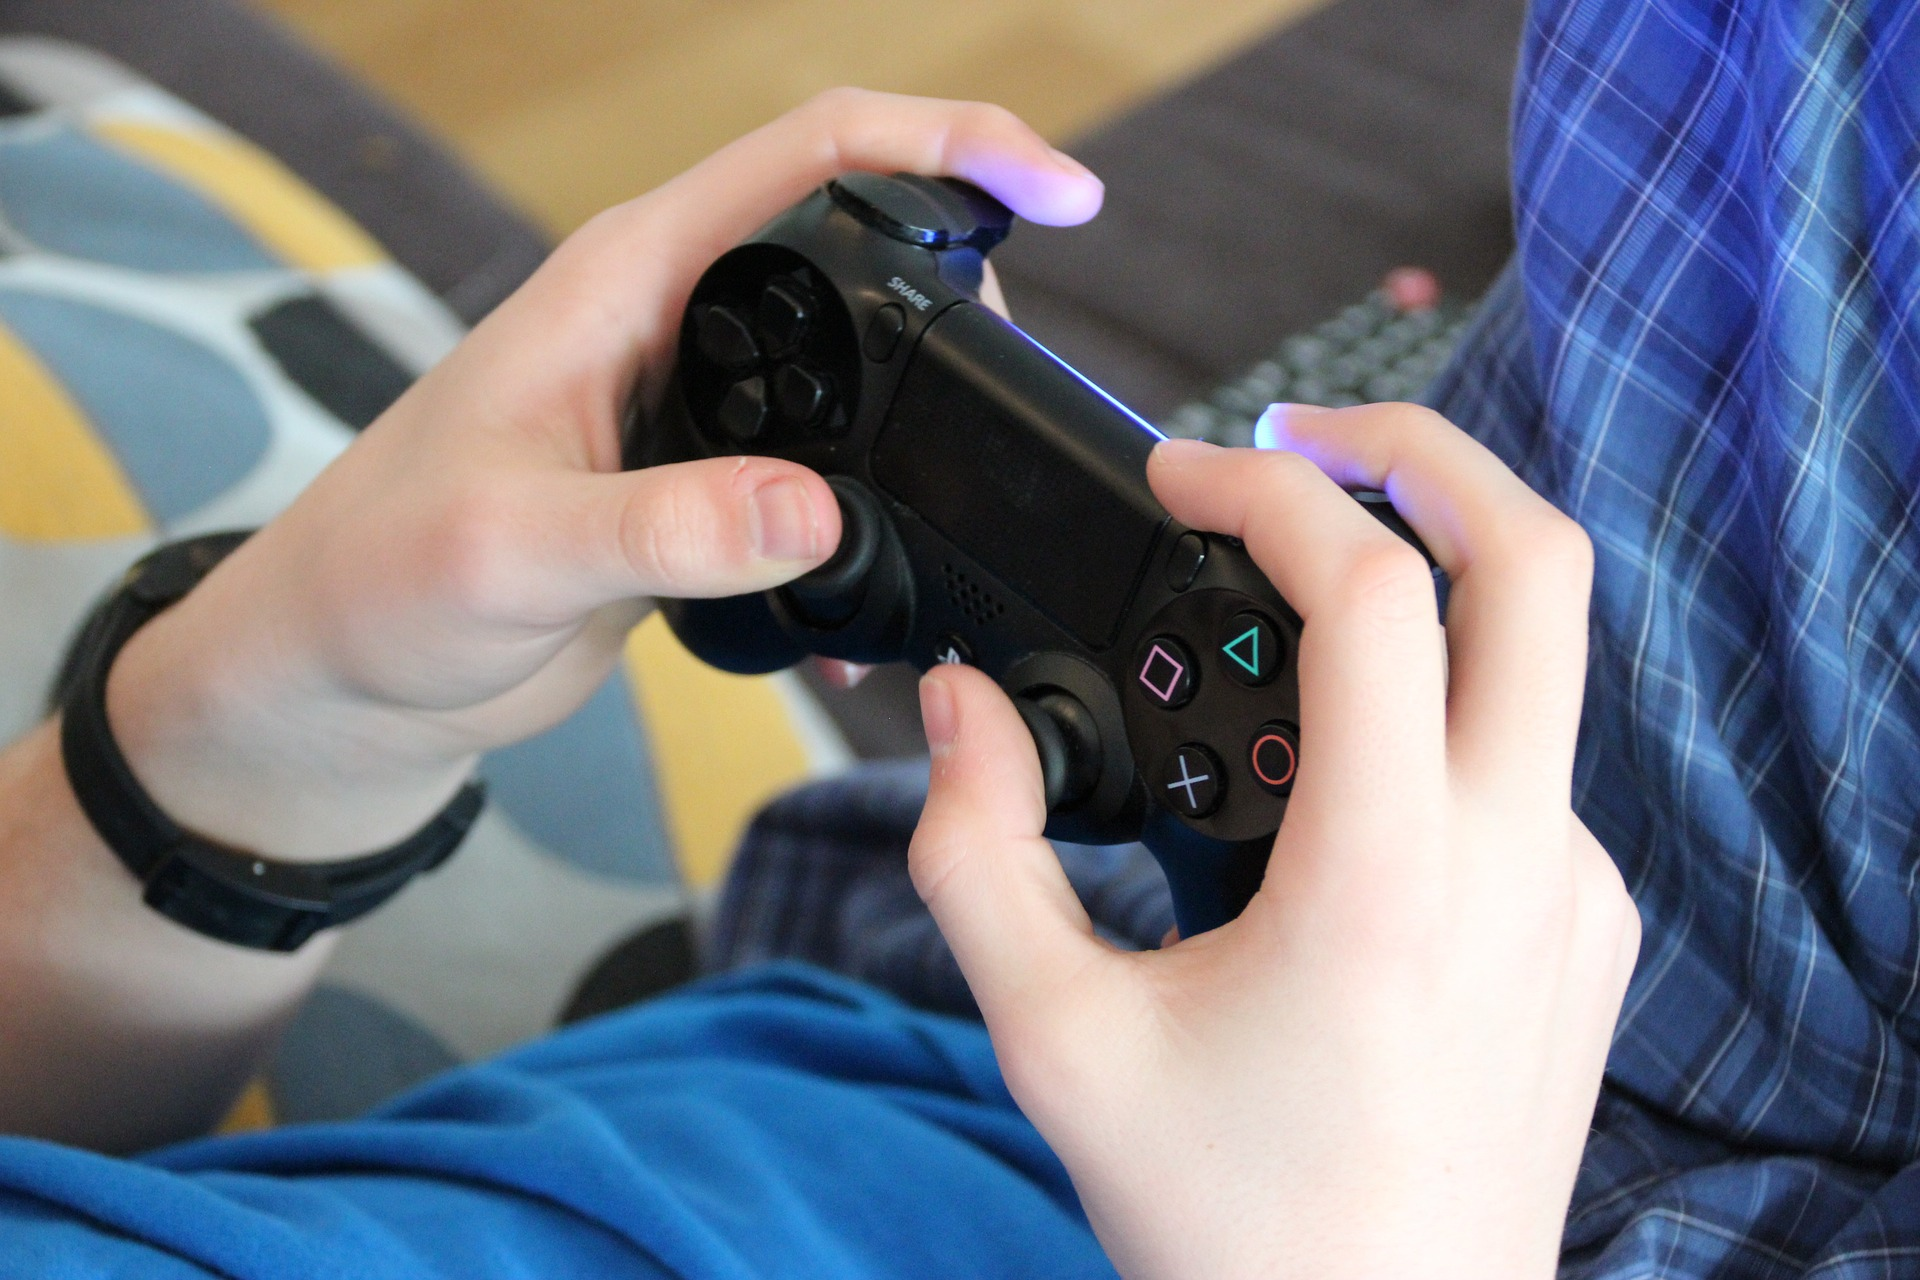 Scuf Gaming Controller Ps4 - Alle schnell gefunden!